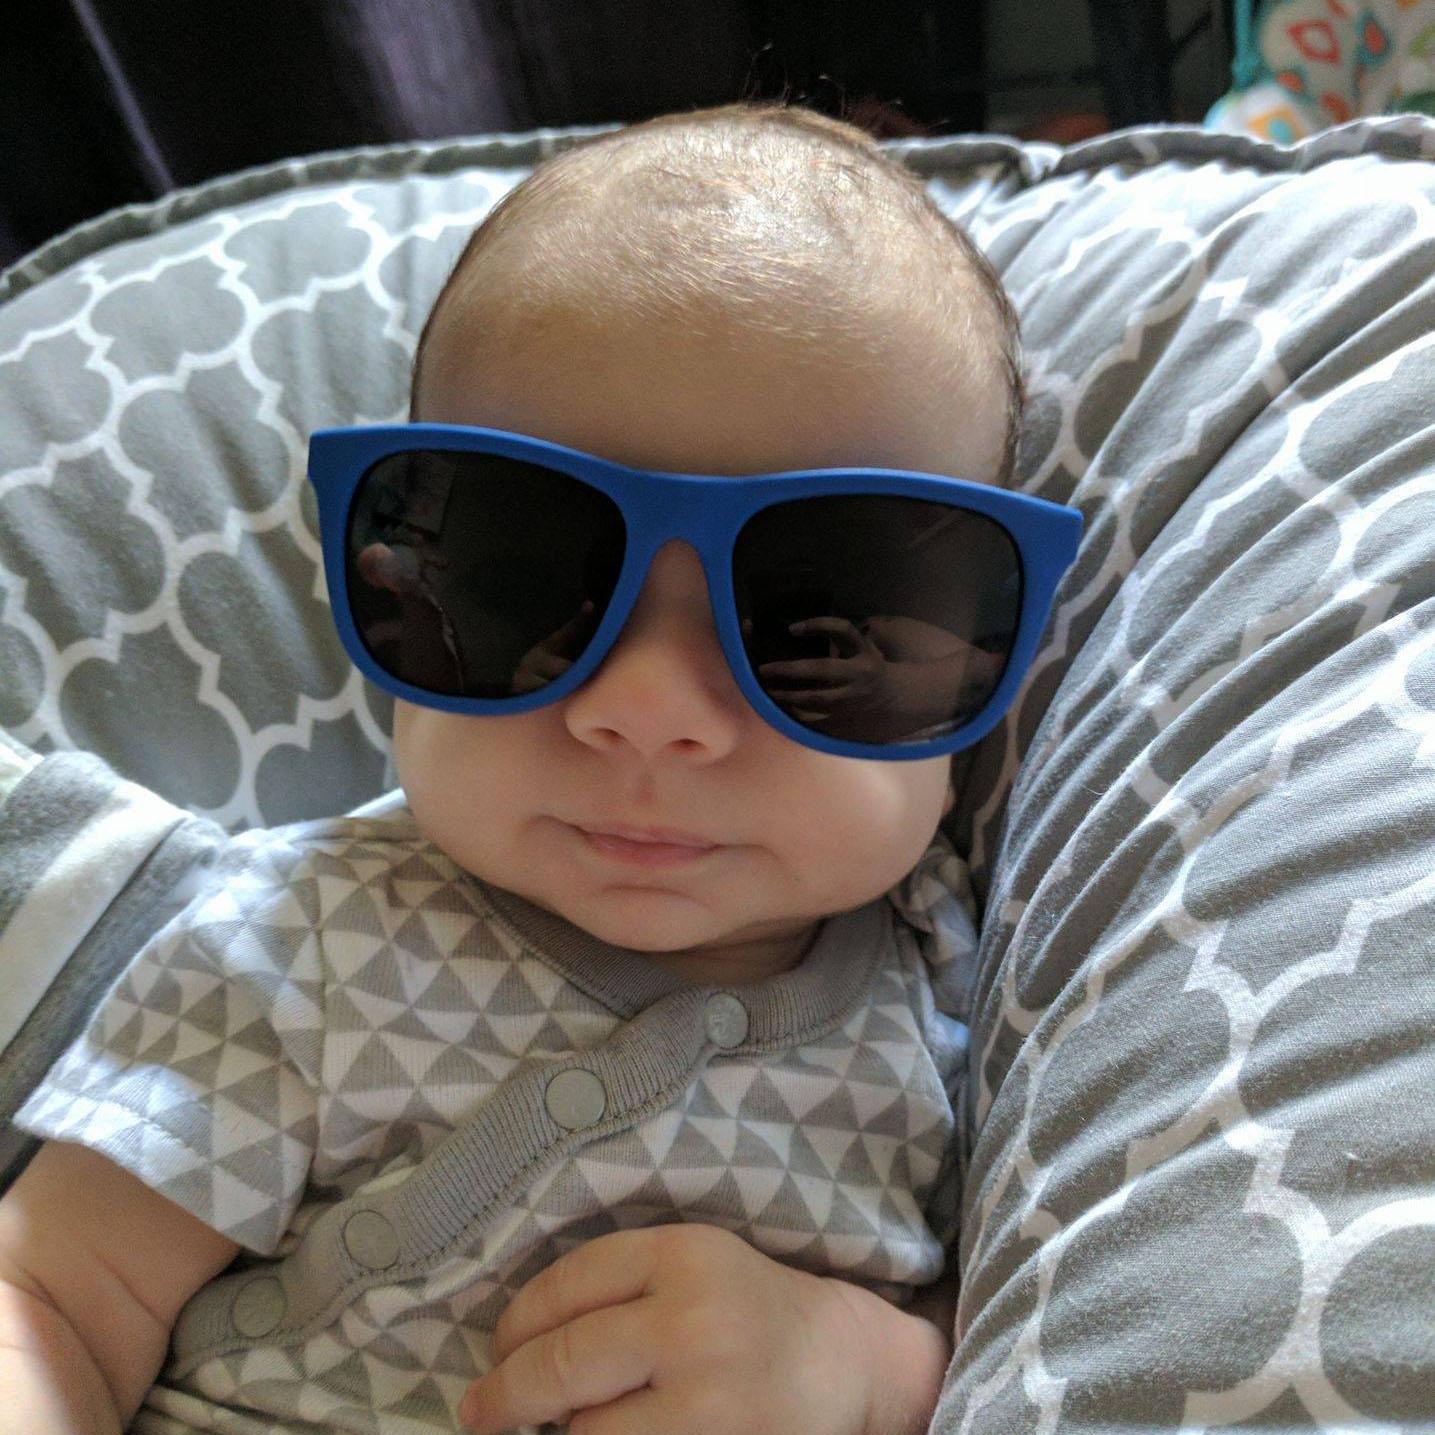 Analyst Aimee Sanfilippo Baby with Sunglasses